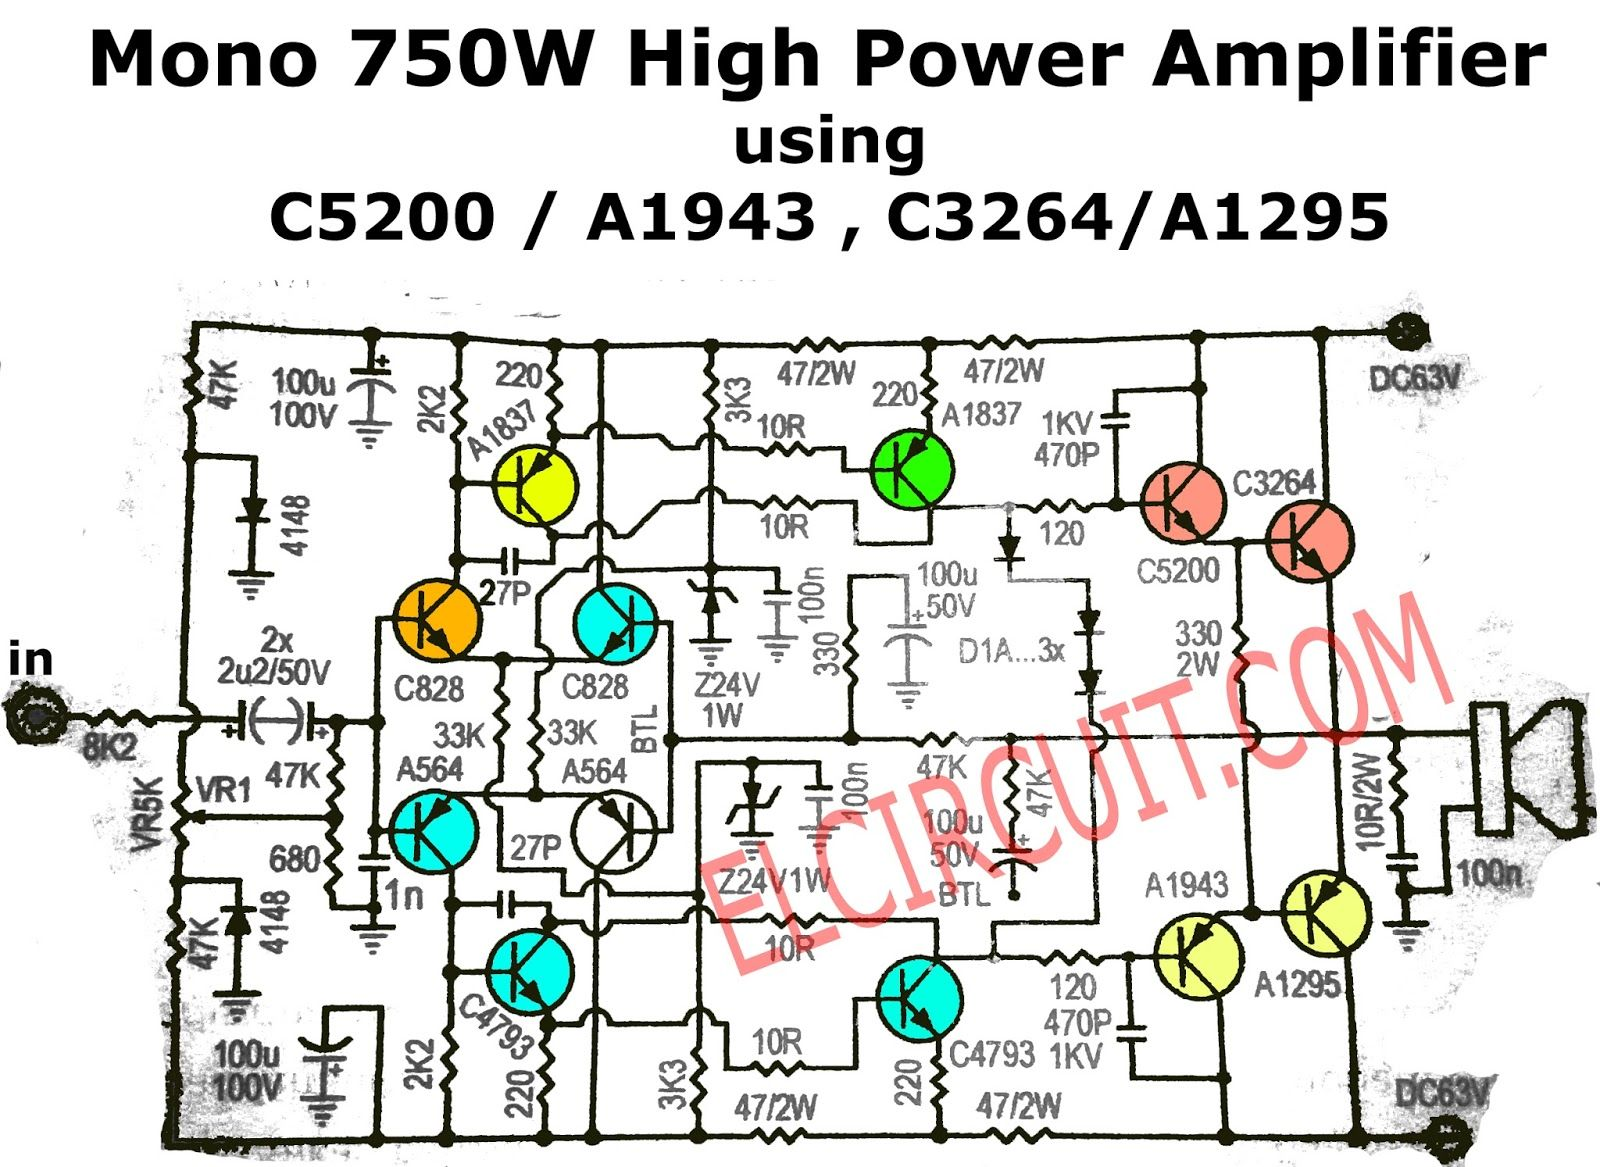 750w mono power amplifier schematic diagram [ 1600 x 1167 Pixel ]